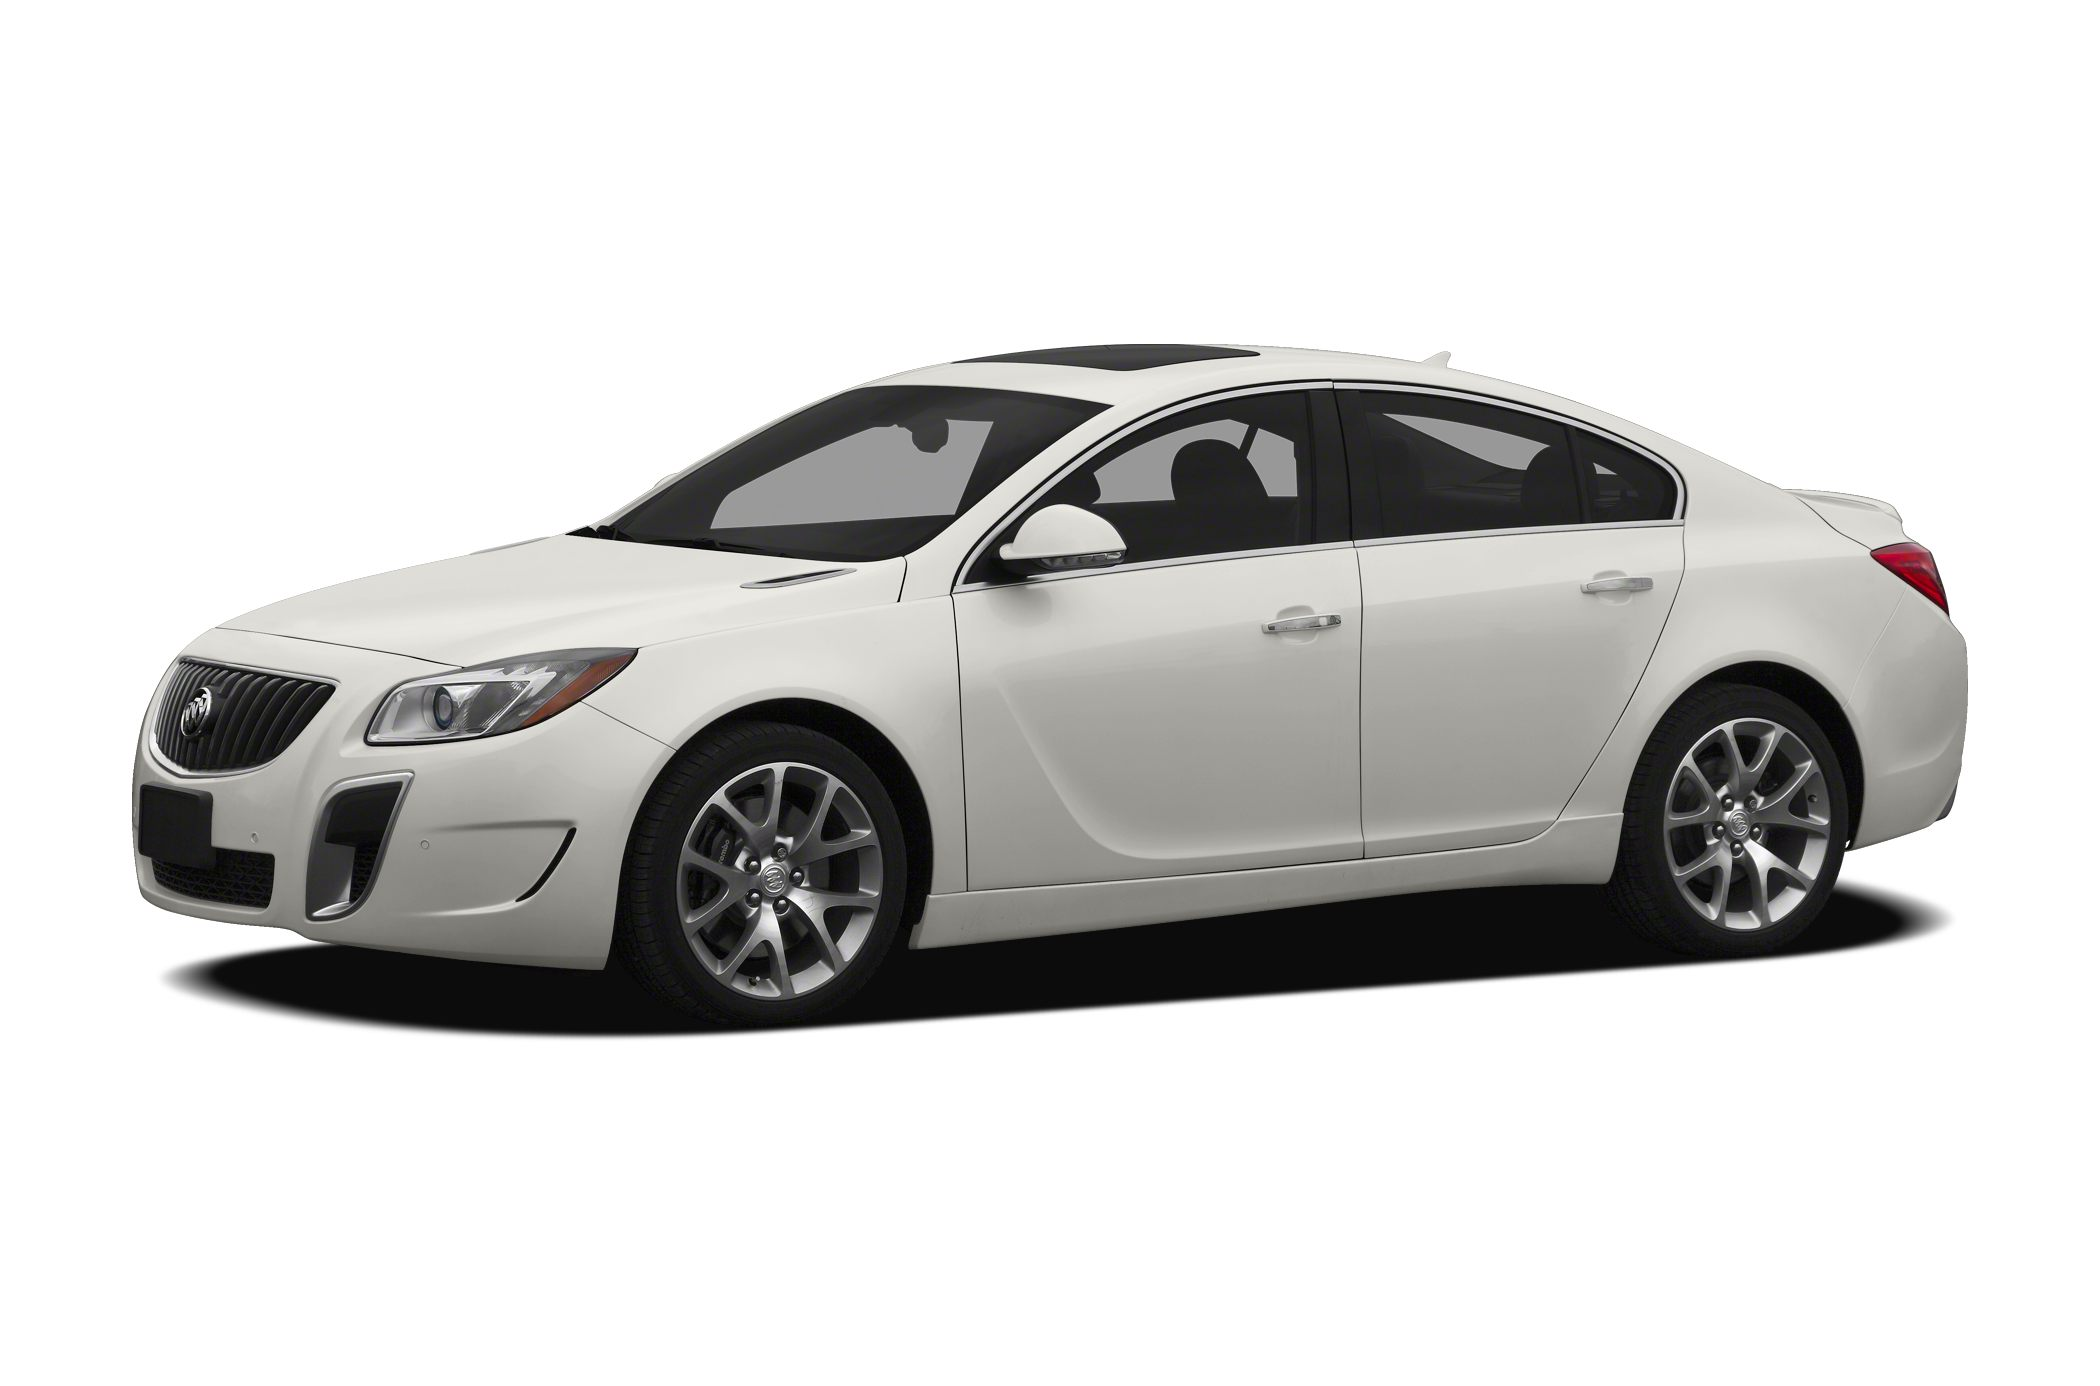 2012 Buick Regal GS Miles 52940Color Black Stock 17441 VIN 2G4GV5GV1C9192906